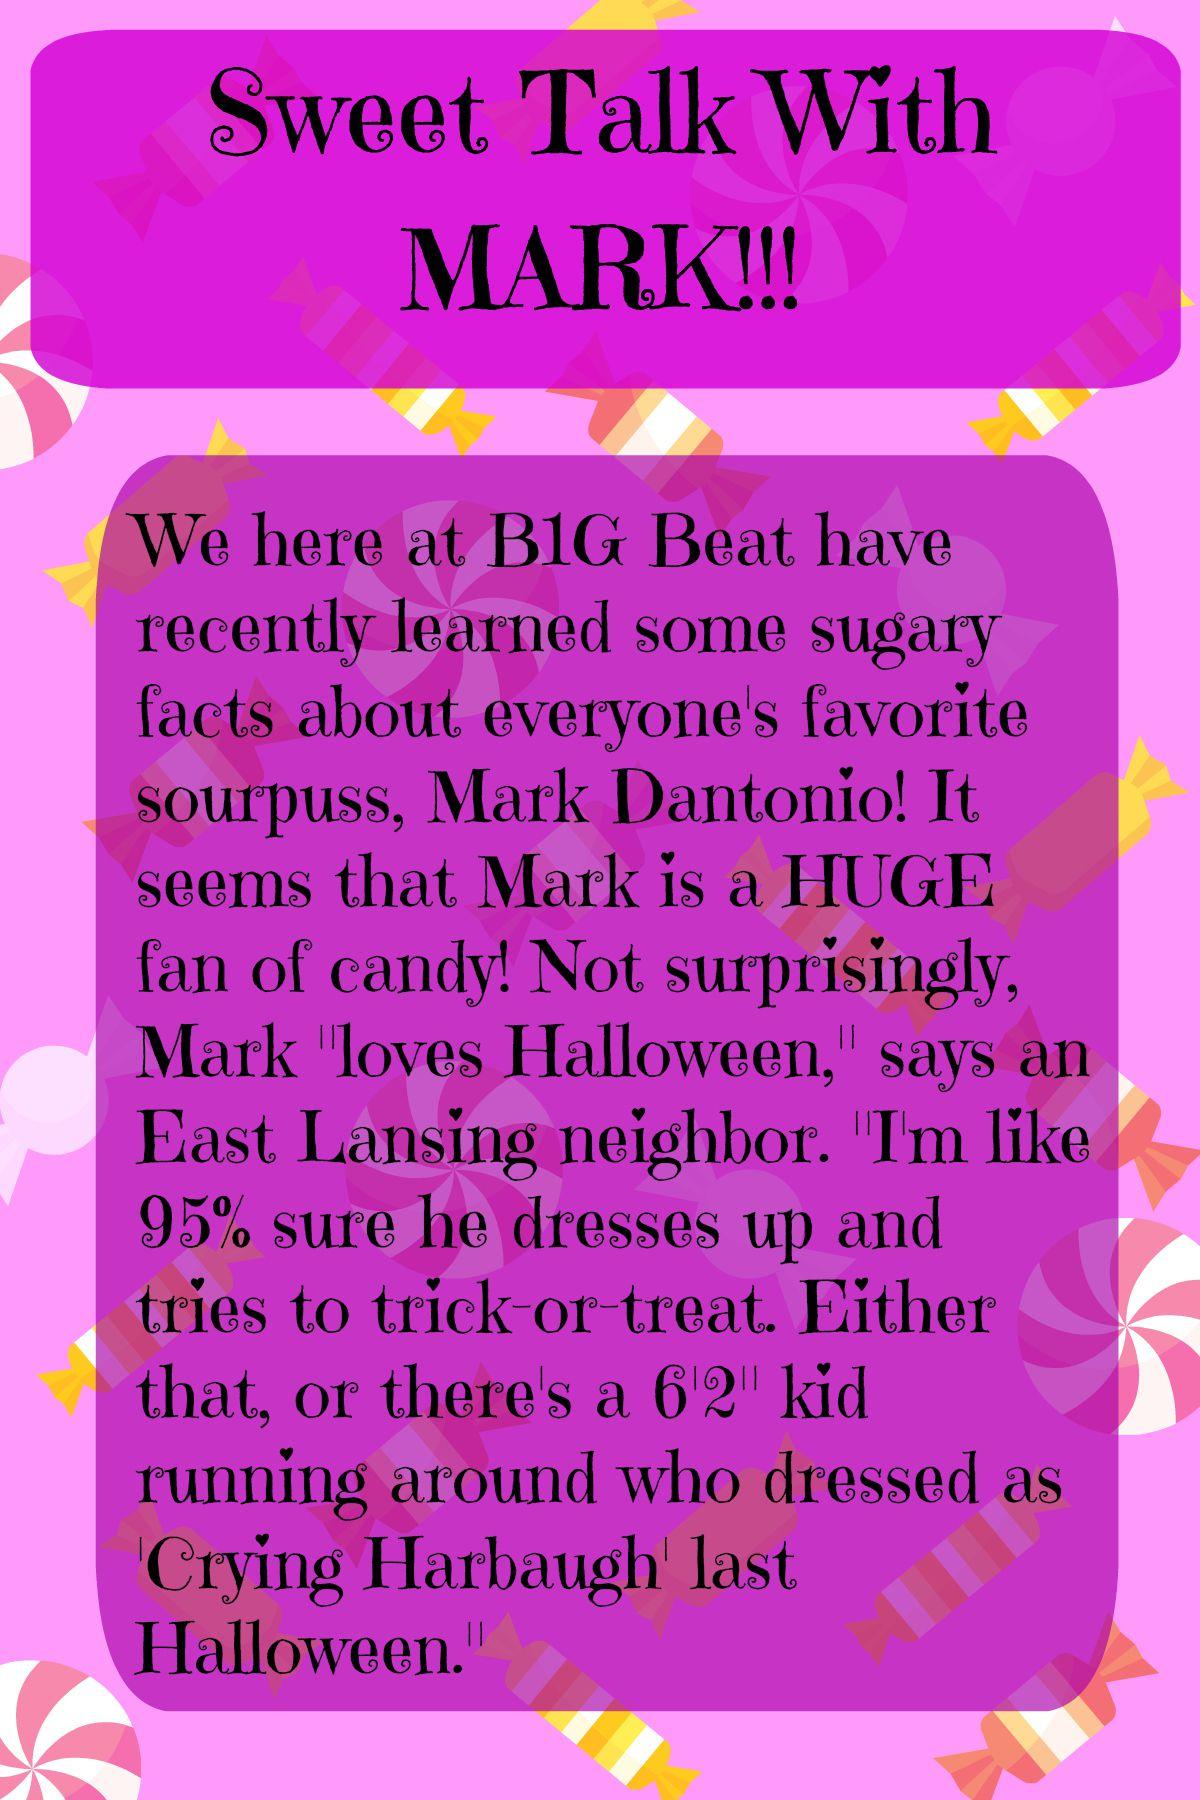 Sweet Talk with Mark